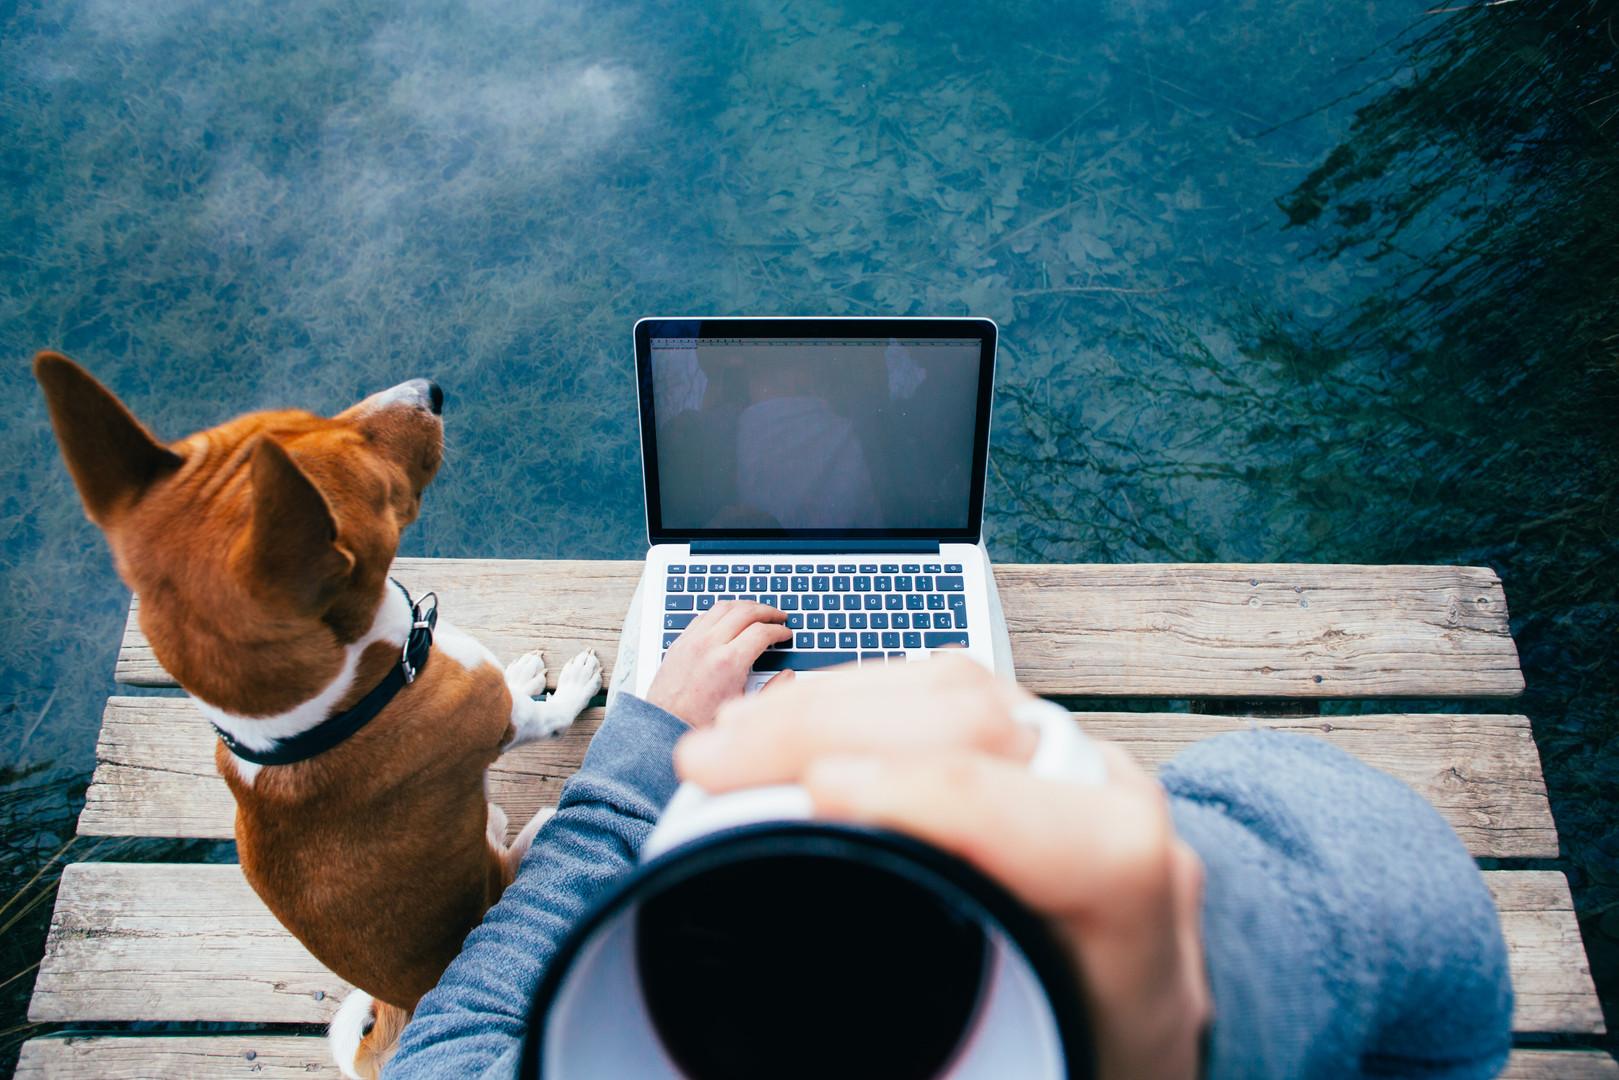 pov-man-drink-coffee-work-laptop-lake.jp